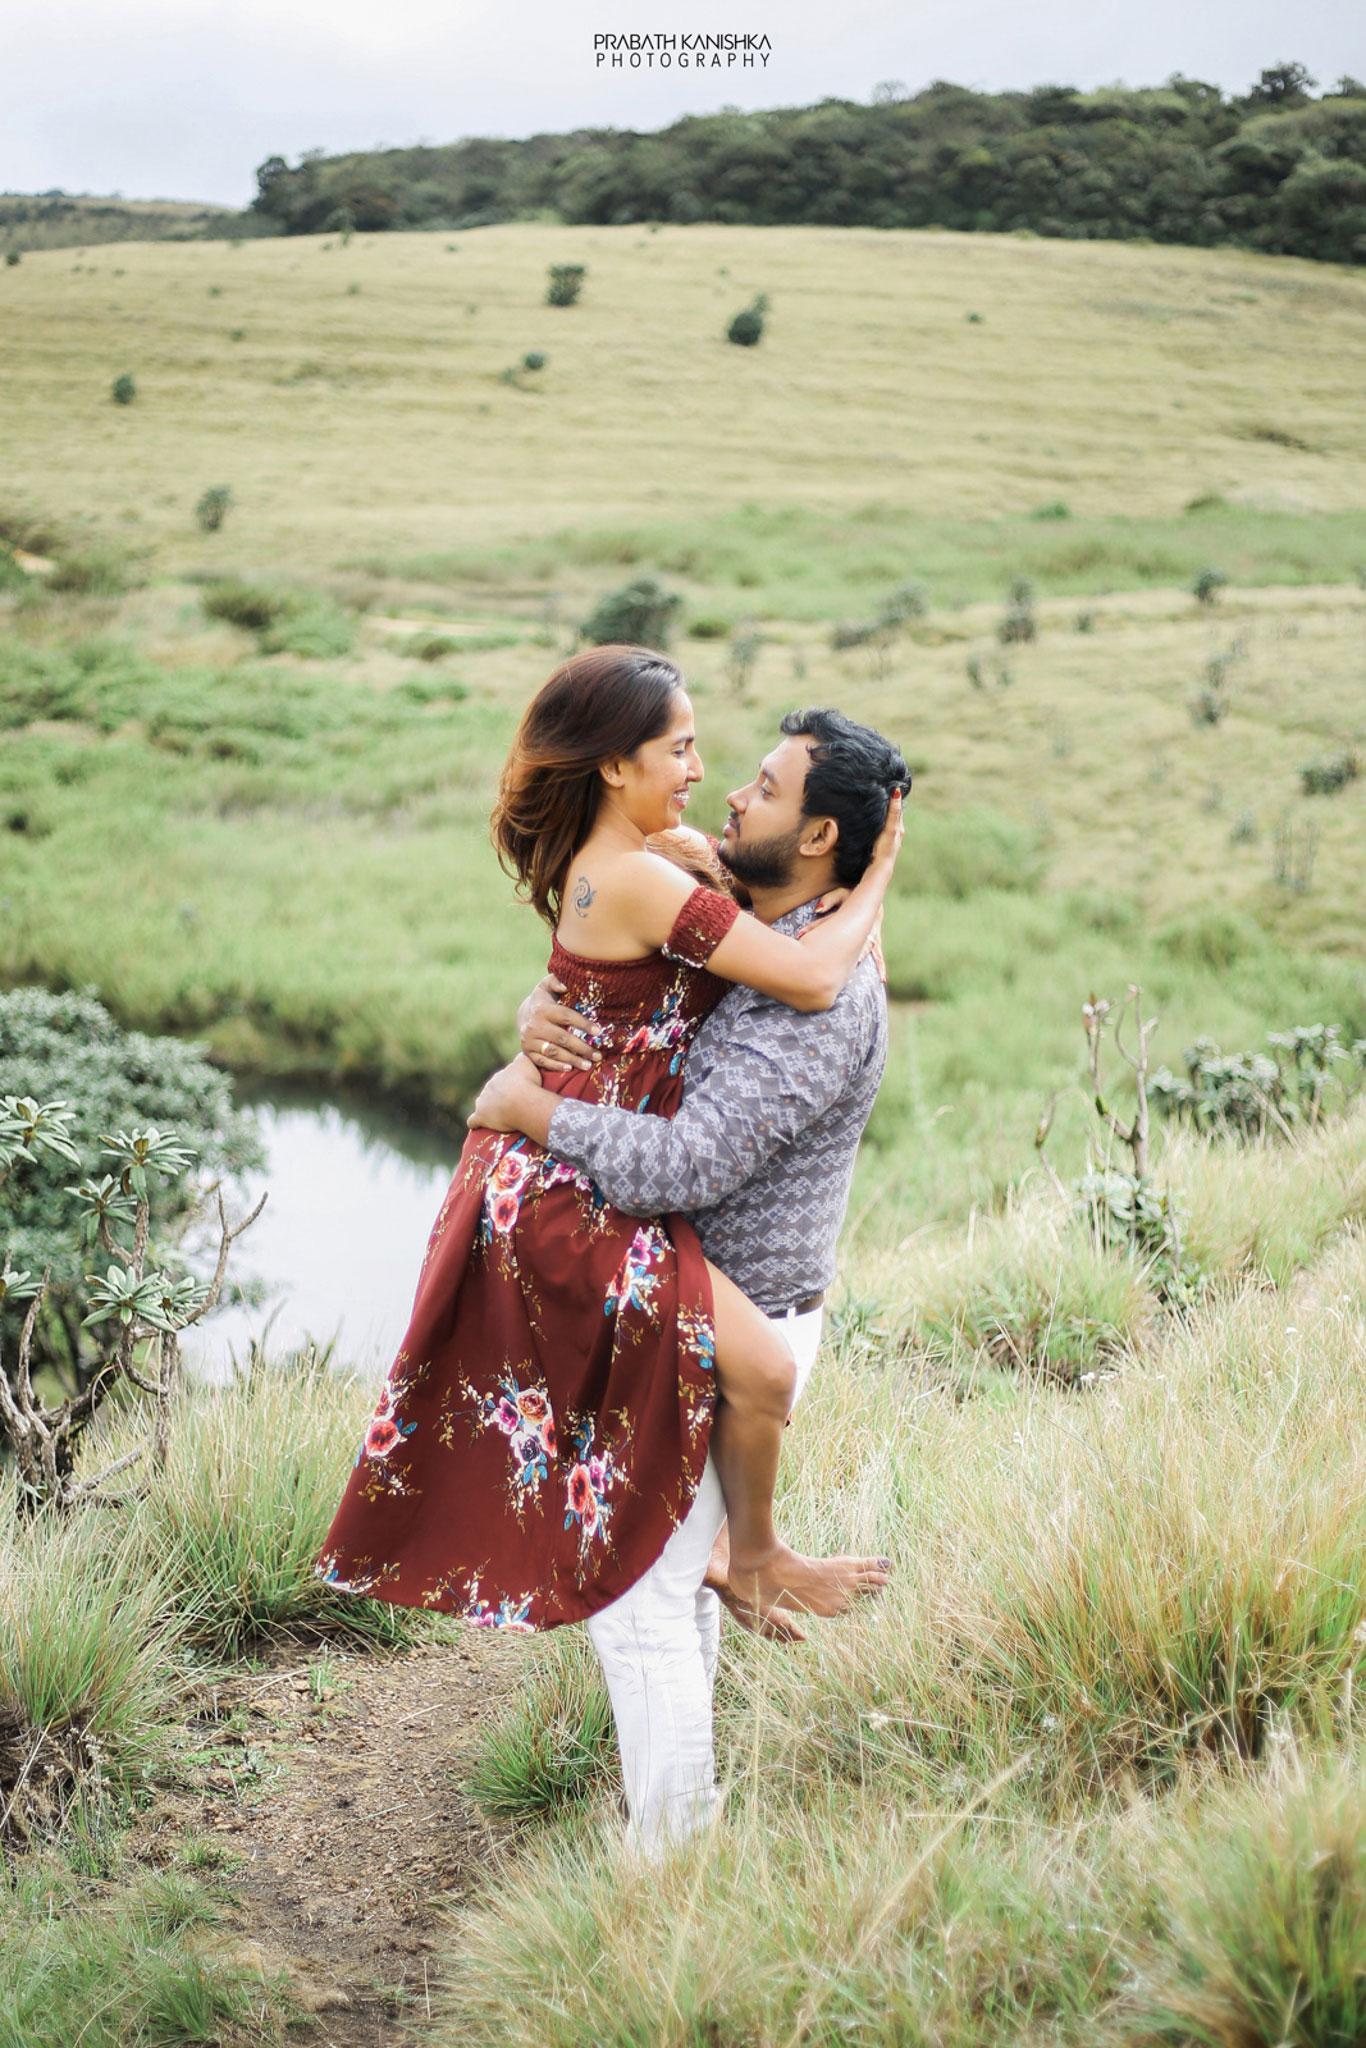 Akhila & Ashen - Prabath Kanishka Wedding Photography